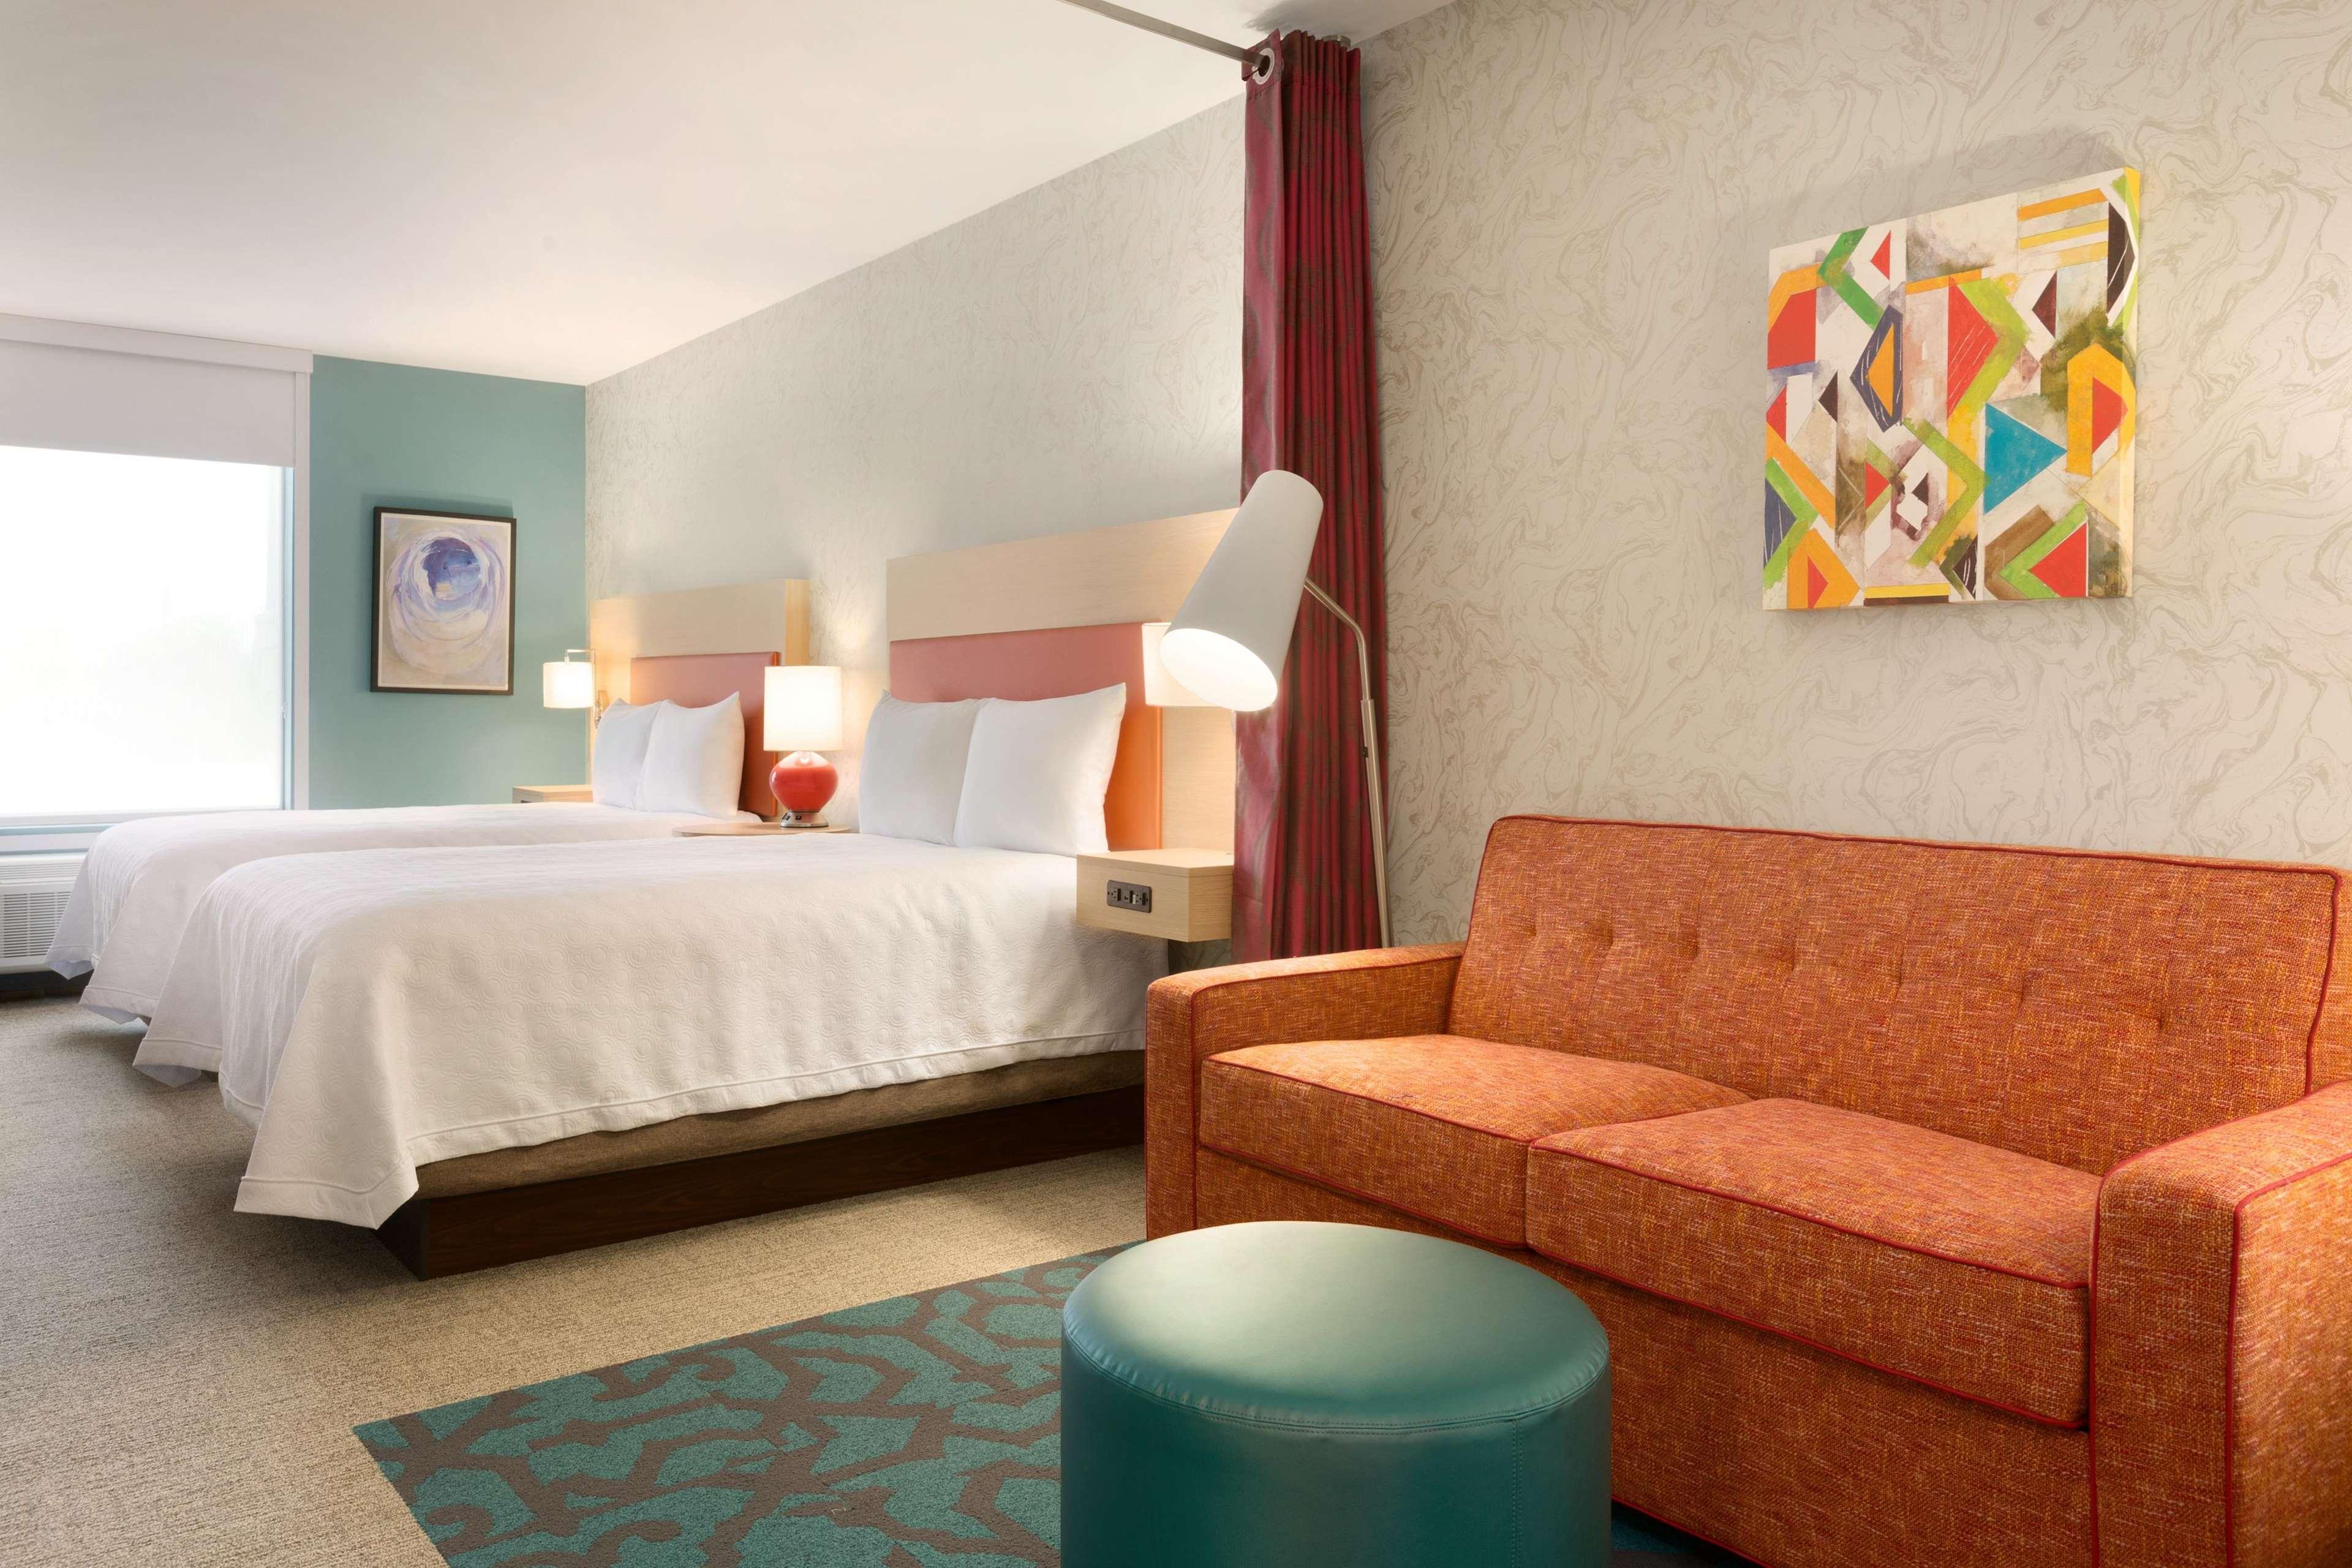 Home2 Suites by Hilton Florence Cincinnati Airport South image 27